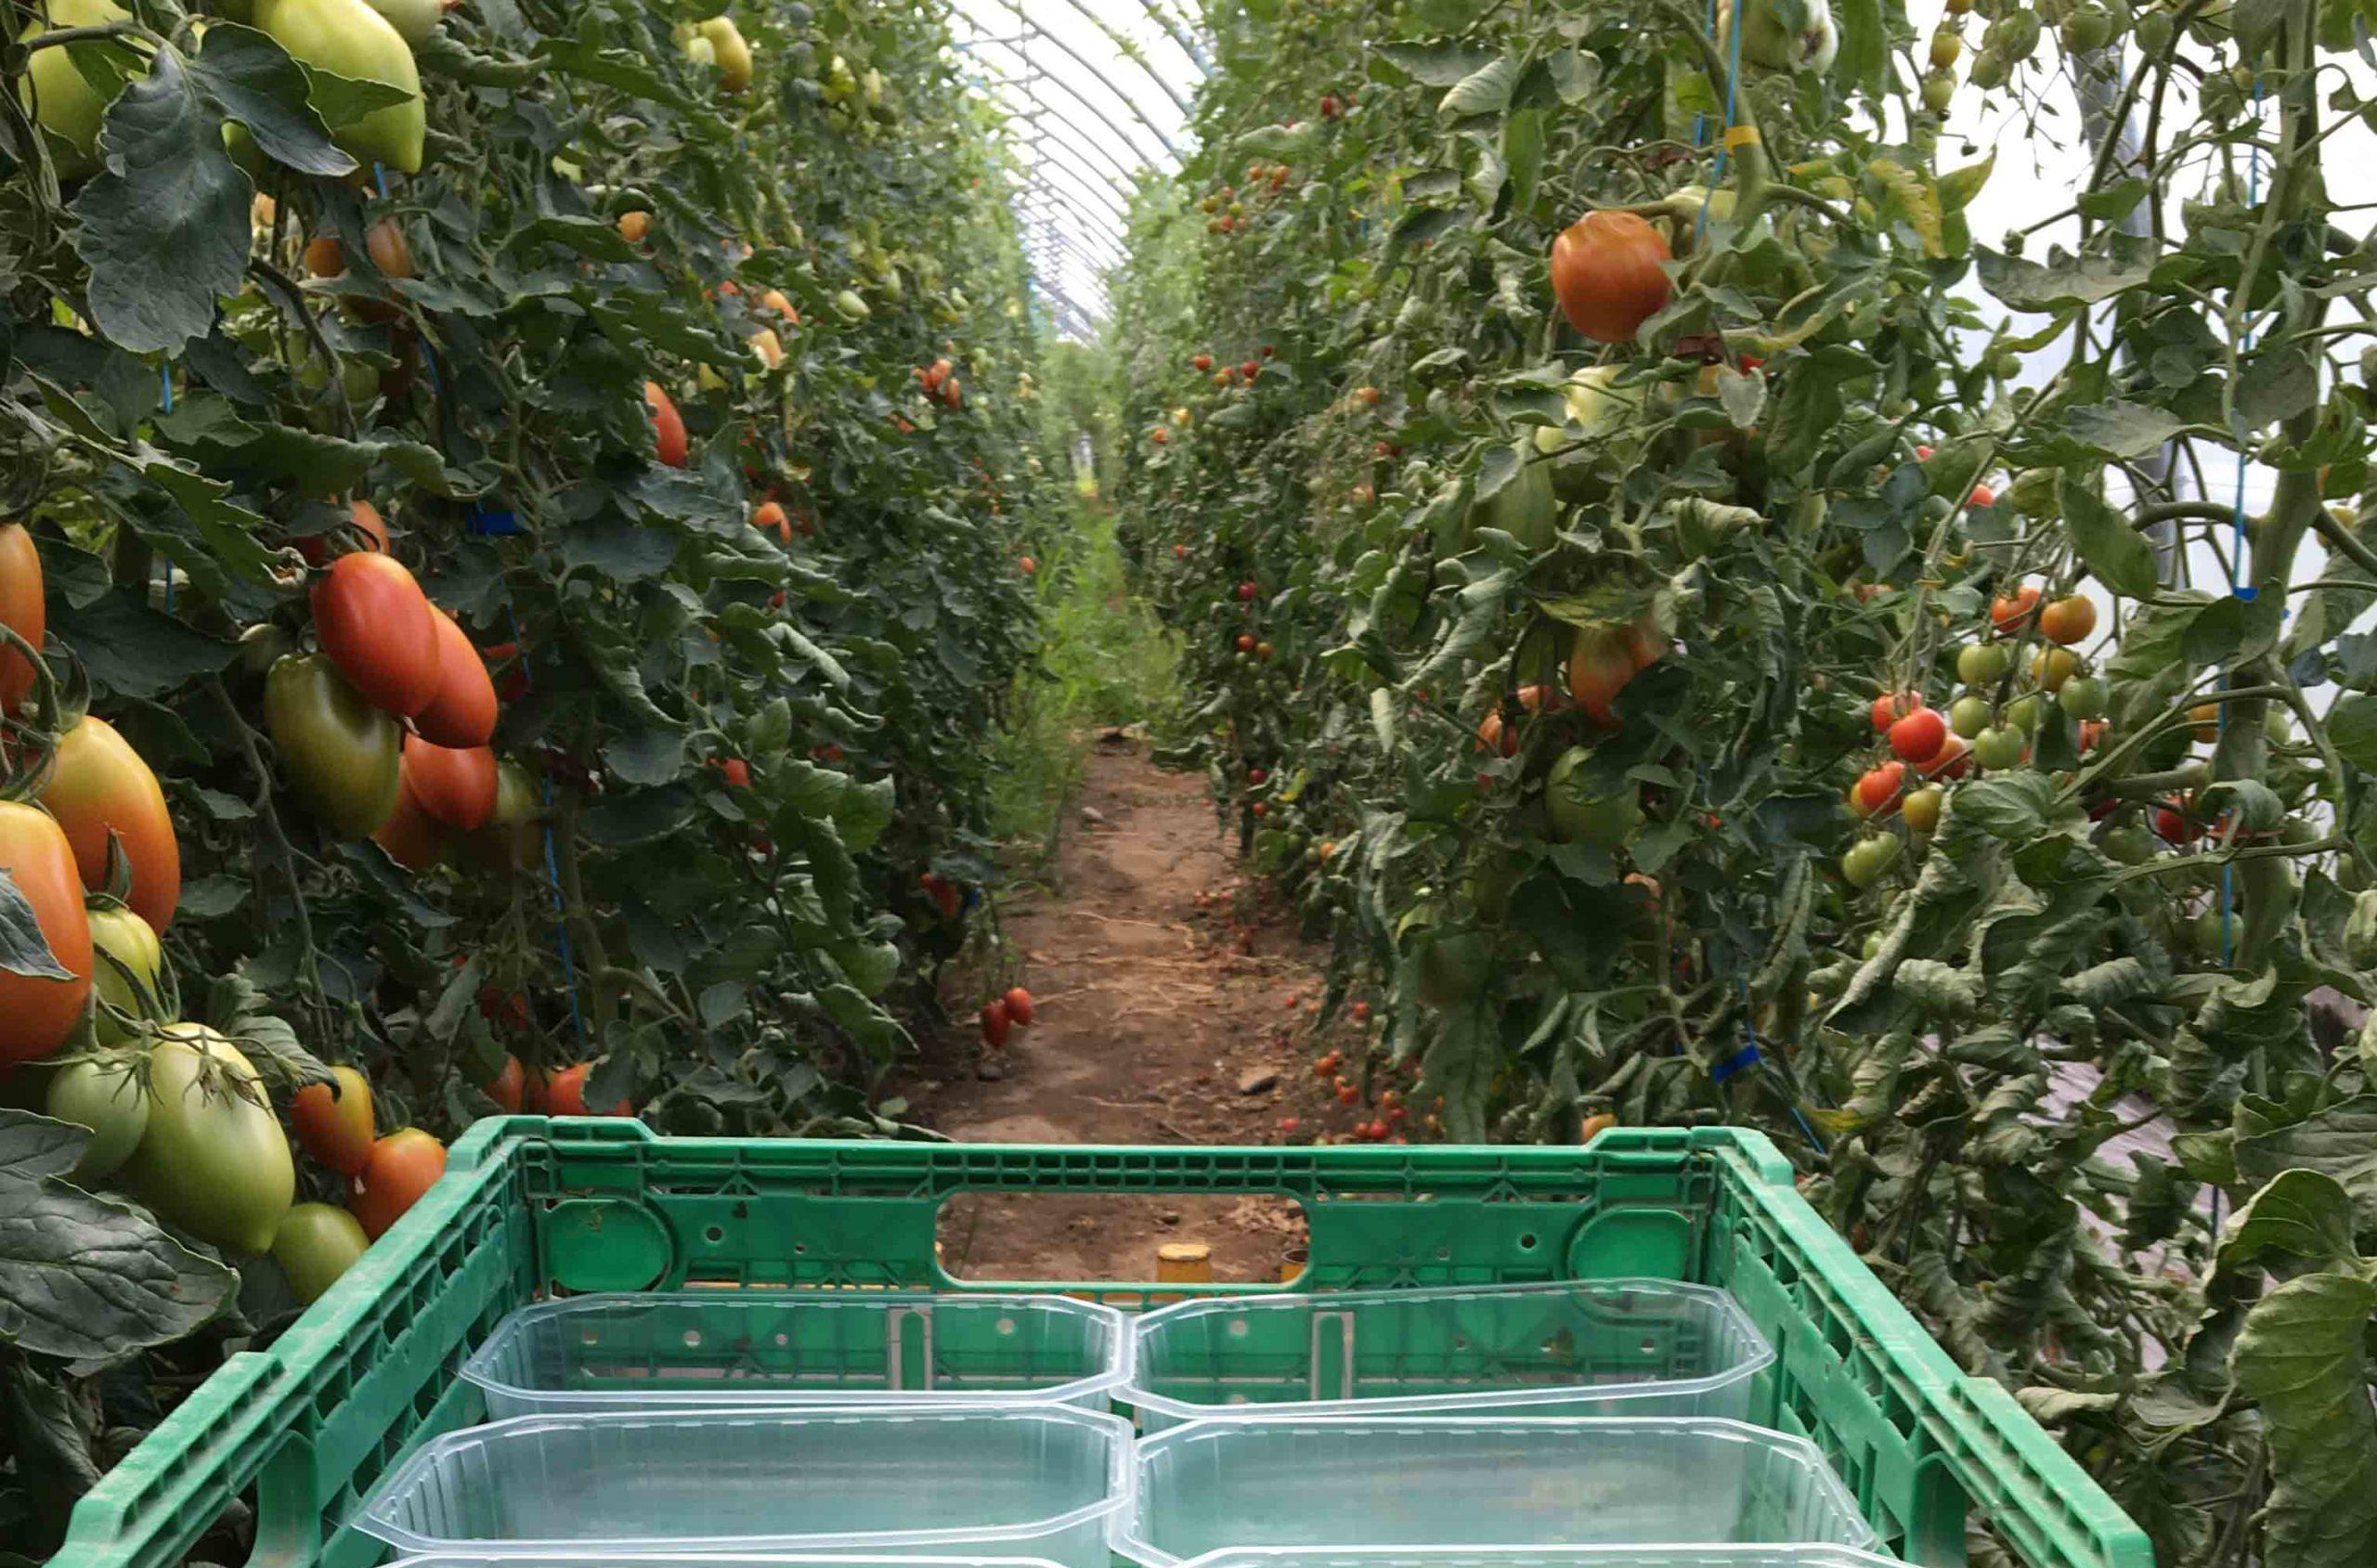 récolte tomates bouchet freres maraicher